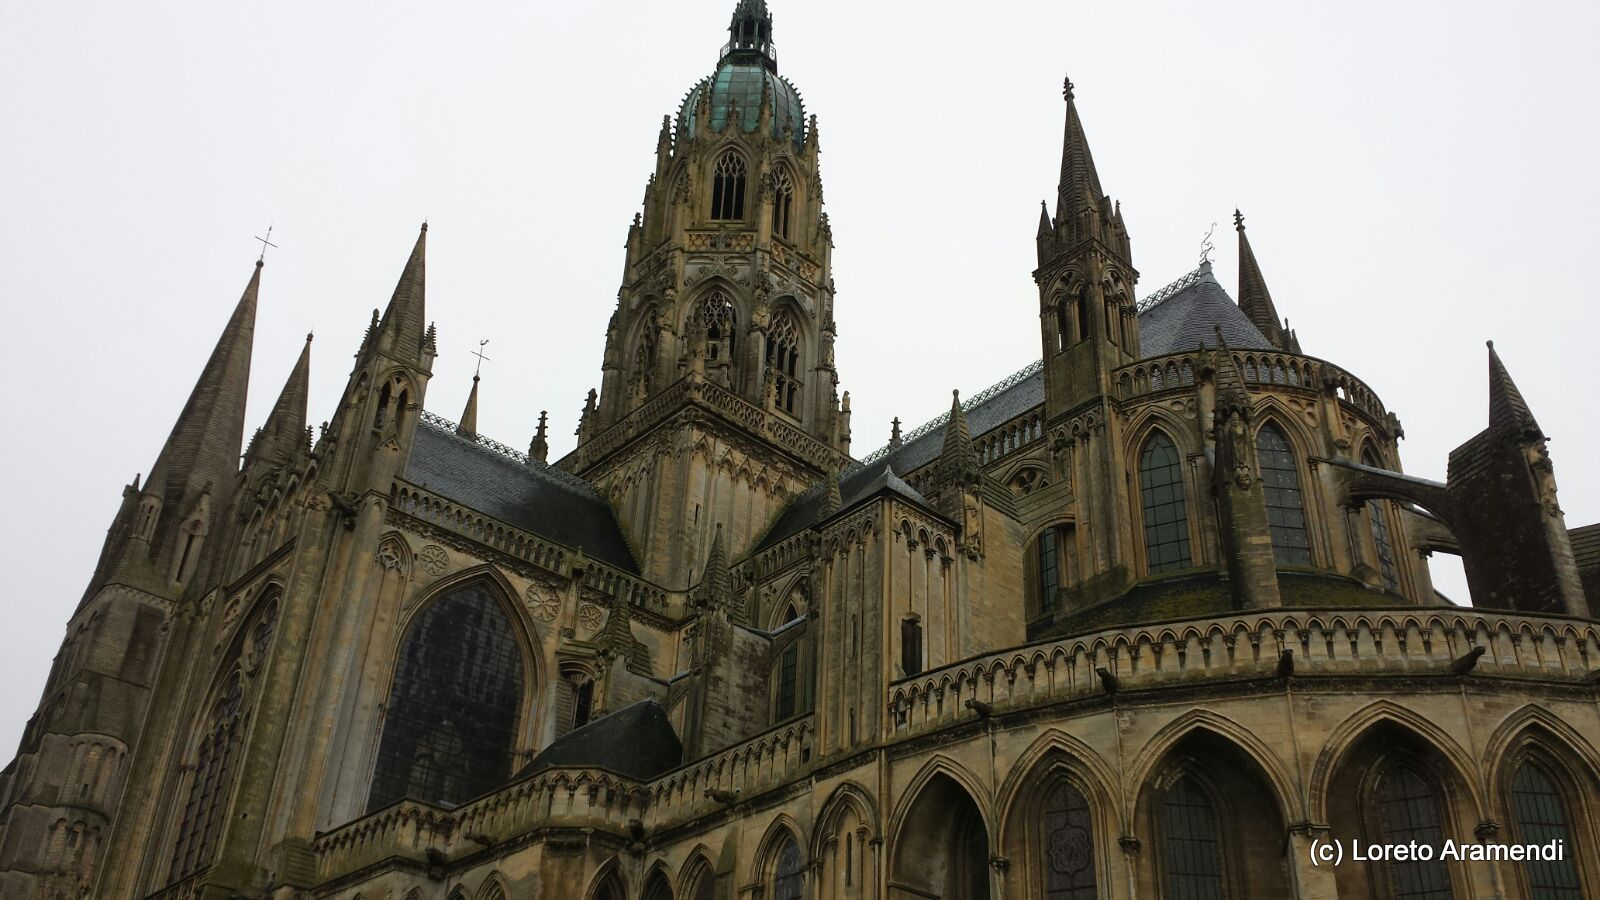 Catedral notre dame bayeux exterior 2 loreto aramendi for Exterior notre dame